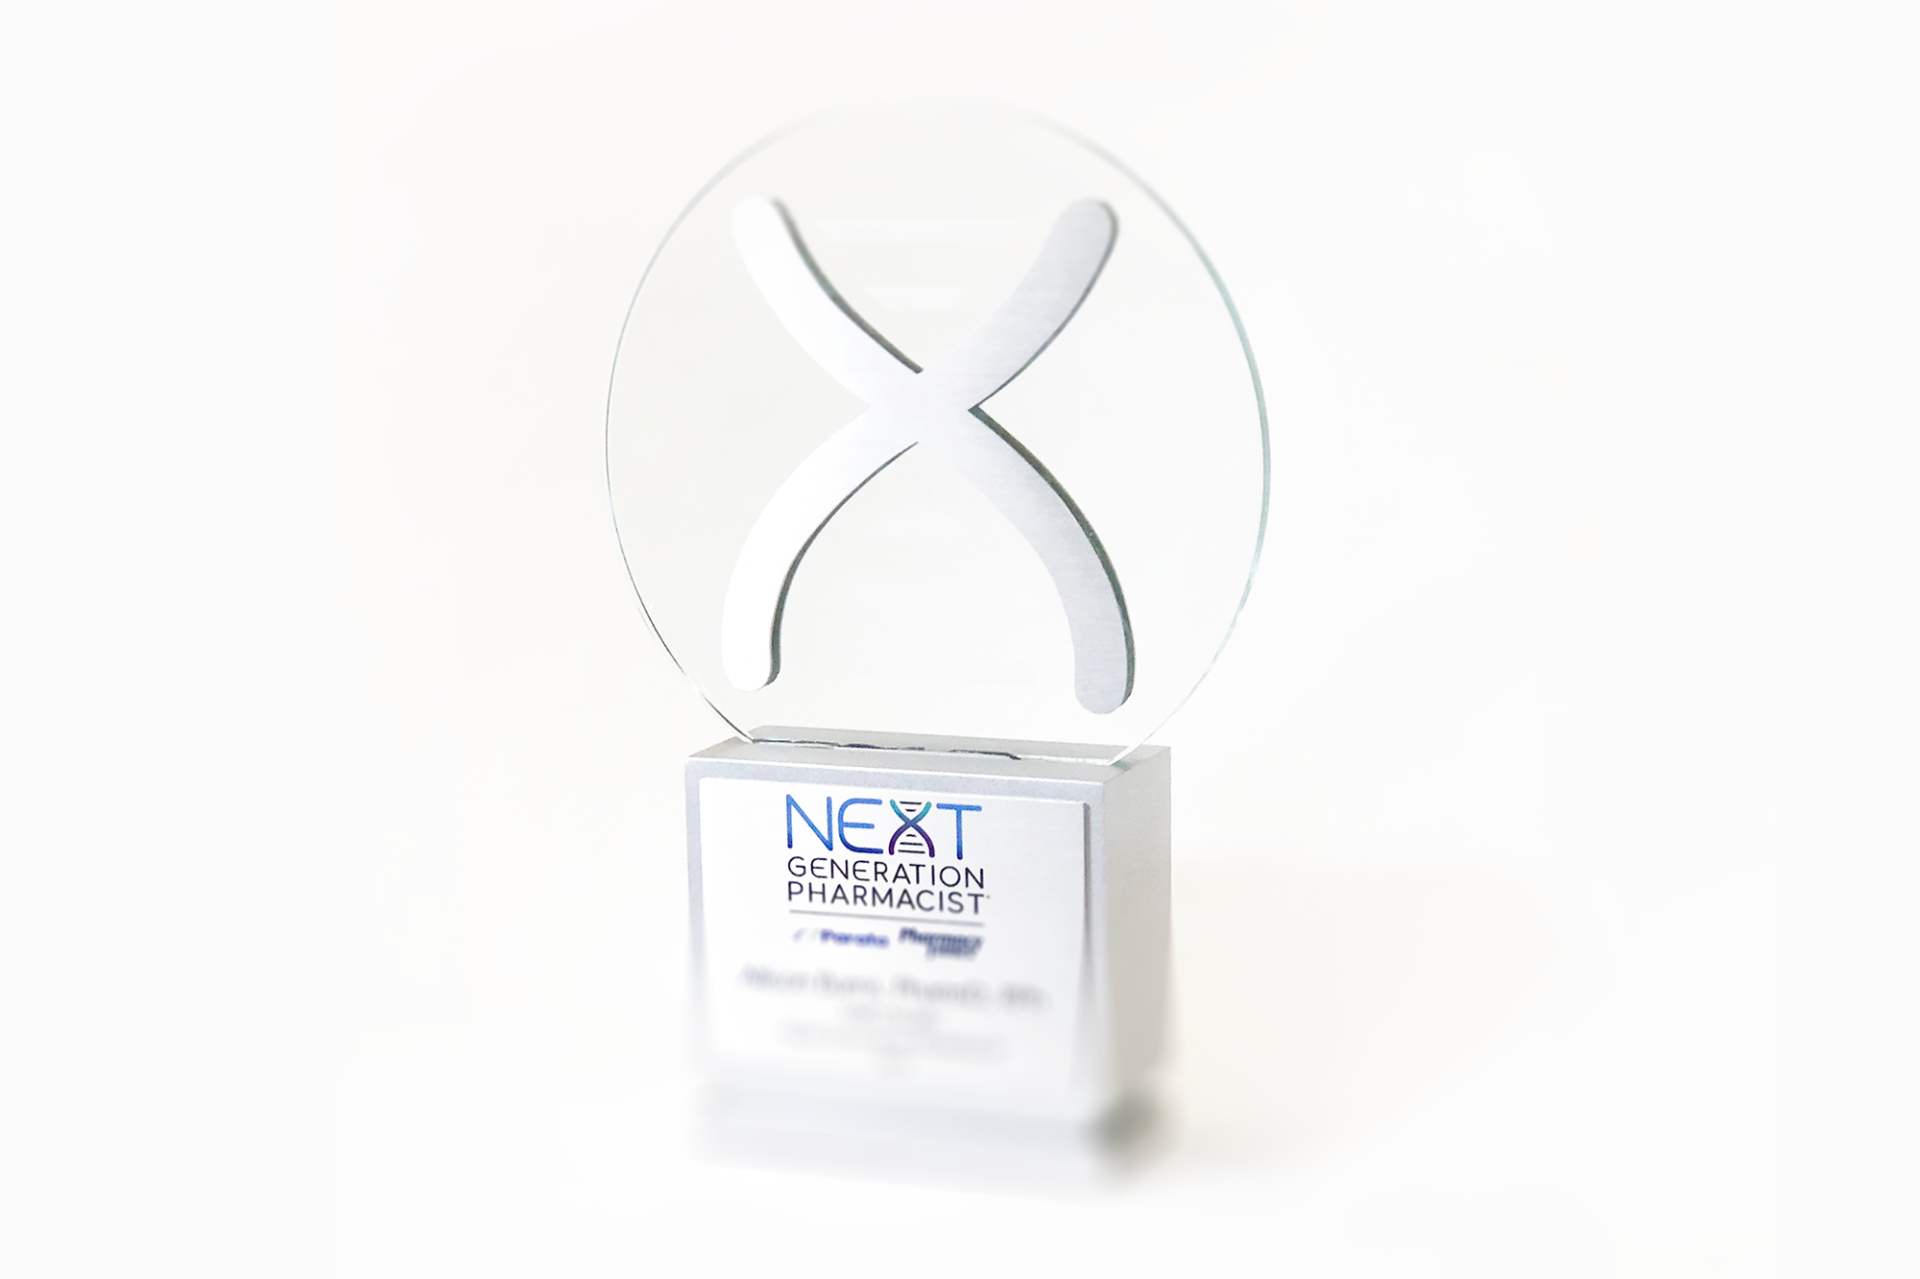 next-generation pharmacist award